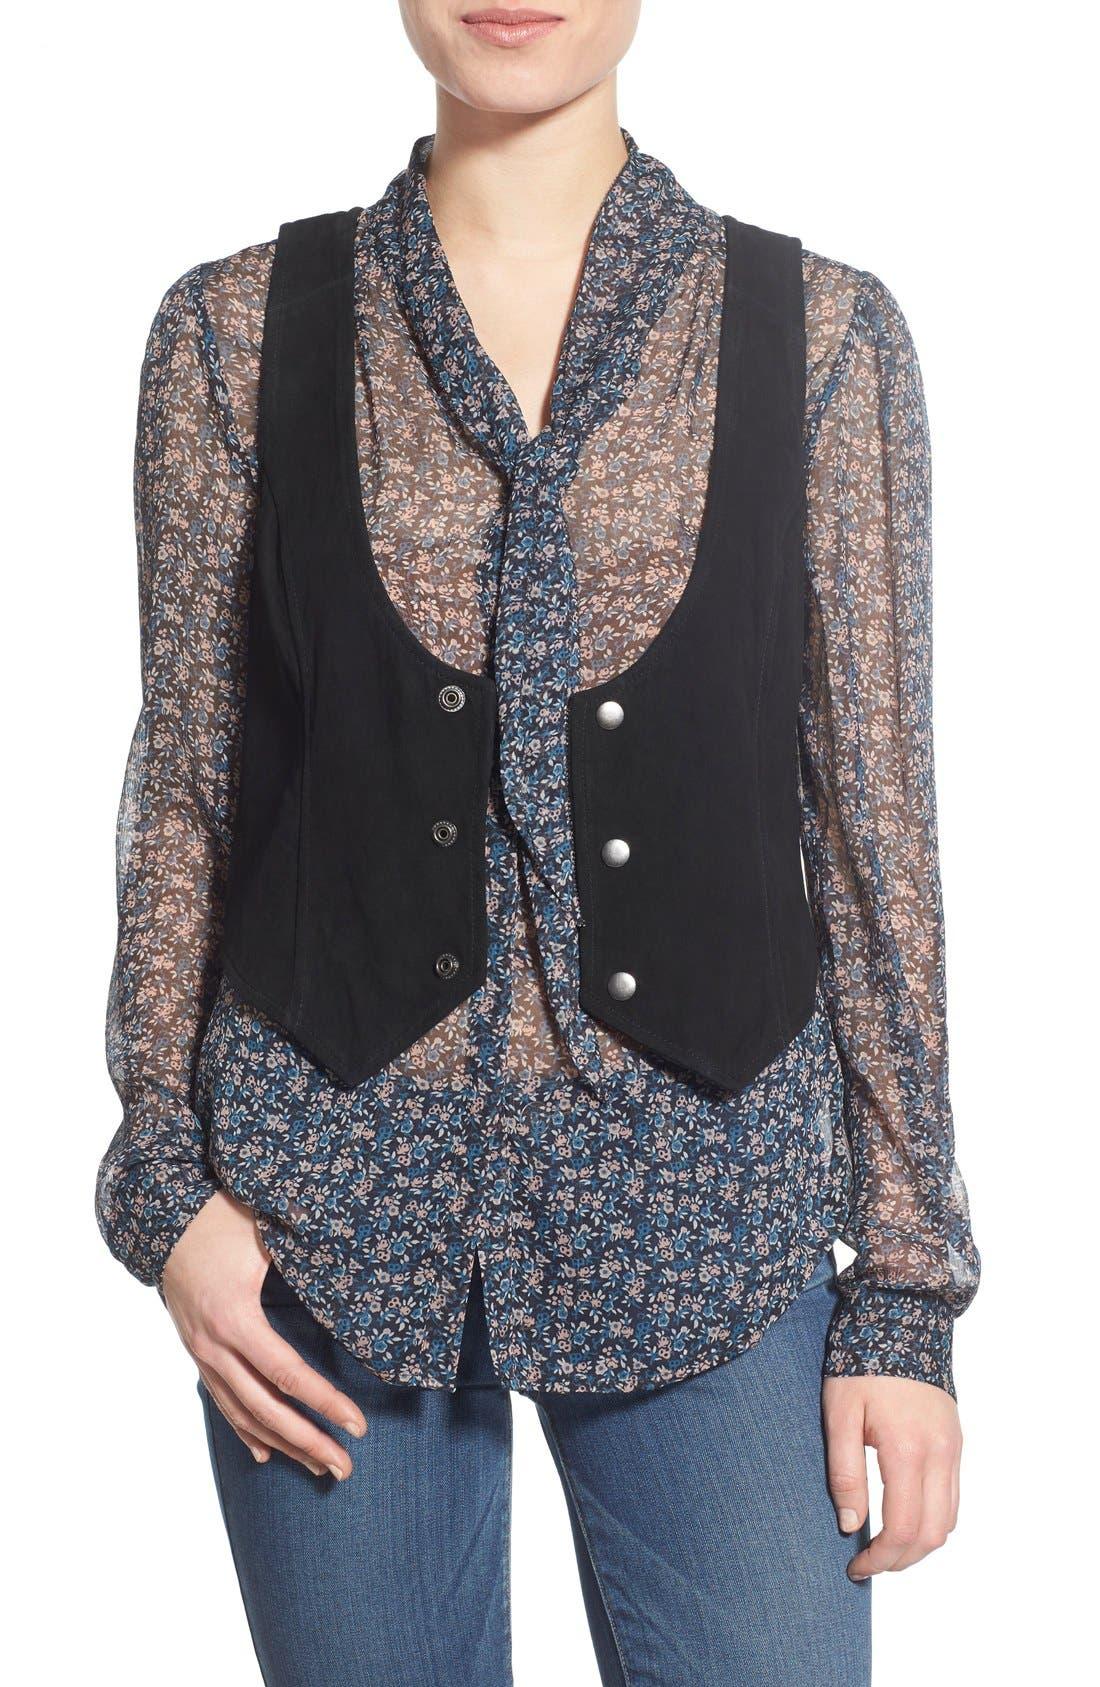 Alternate Image 1 Selected - PAIGE 'Janelle' Suede Vest